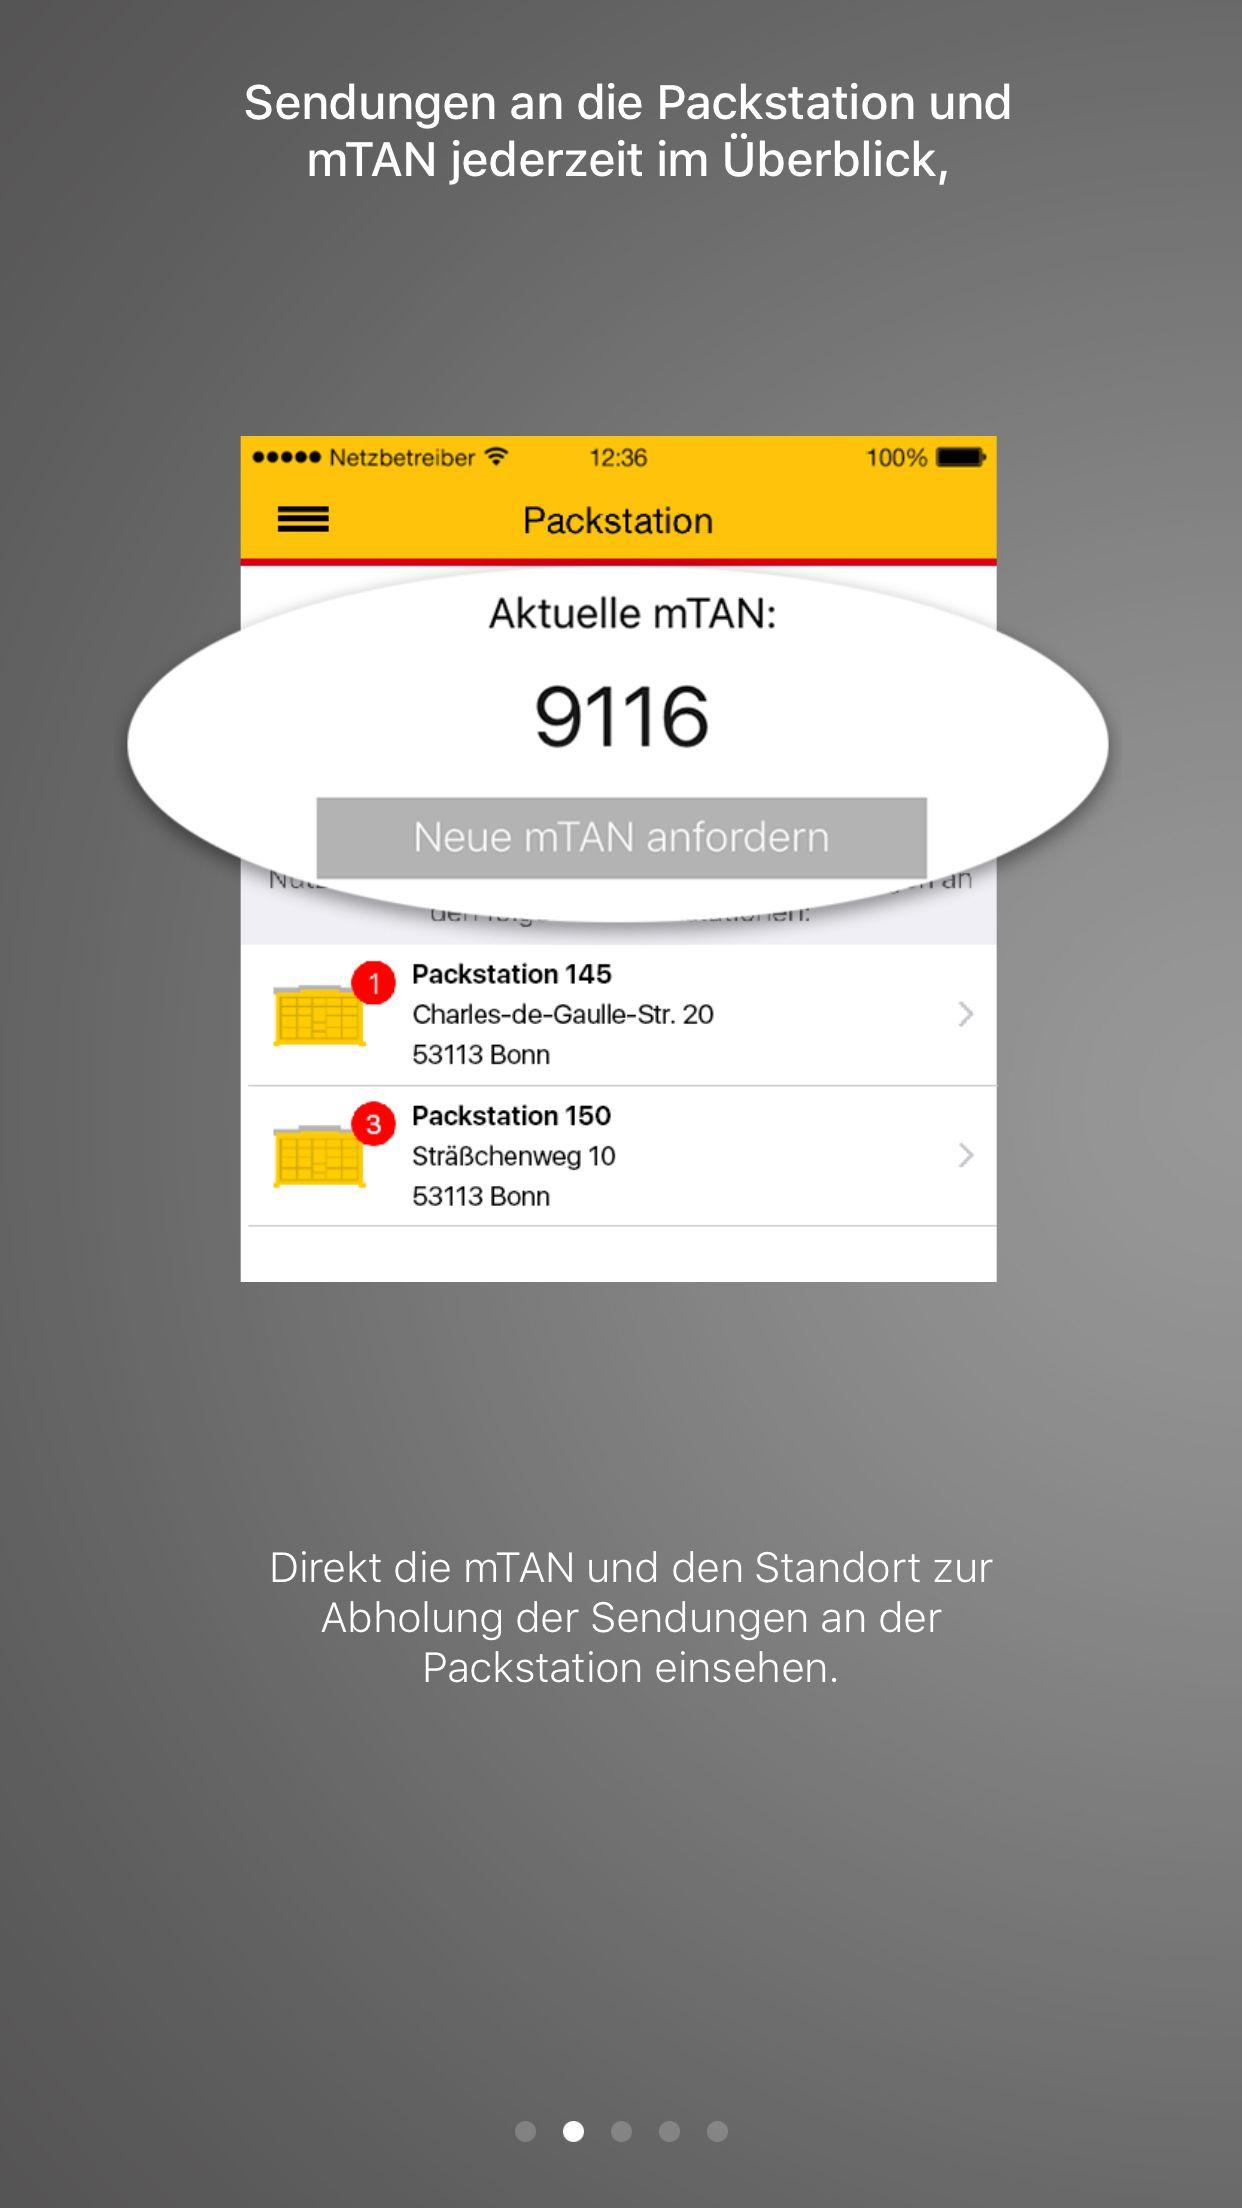 NUR ALS ZITAT Screenshot DHL-Paket-App